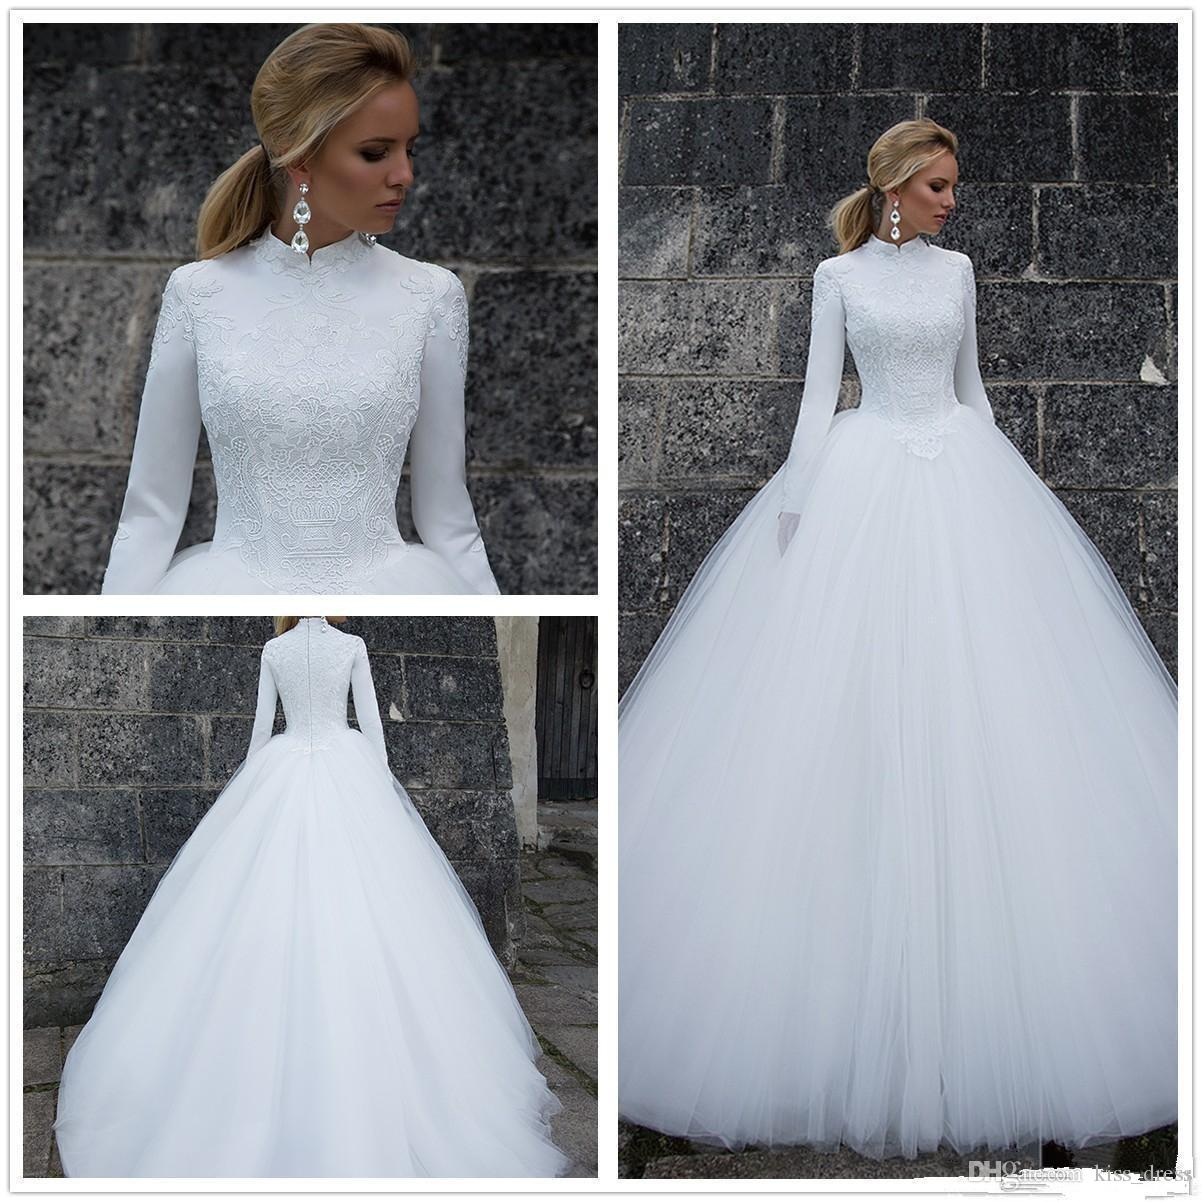 f4c5c063767 Discount Modest Muslim Lace Wedding Dresses 2019 New Design Custom Sweep  Train High Neck A Line Long Sleeve Tulle Bridal Gowns Vestidos De Novia  W602 A Line ...